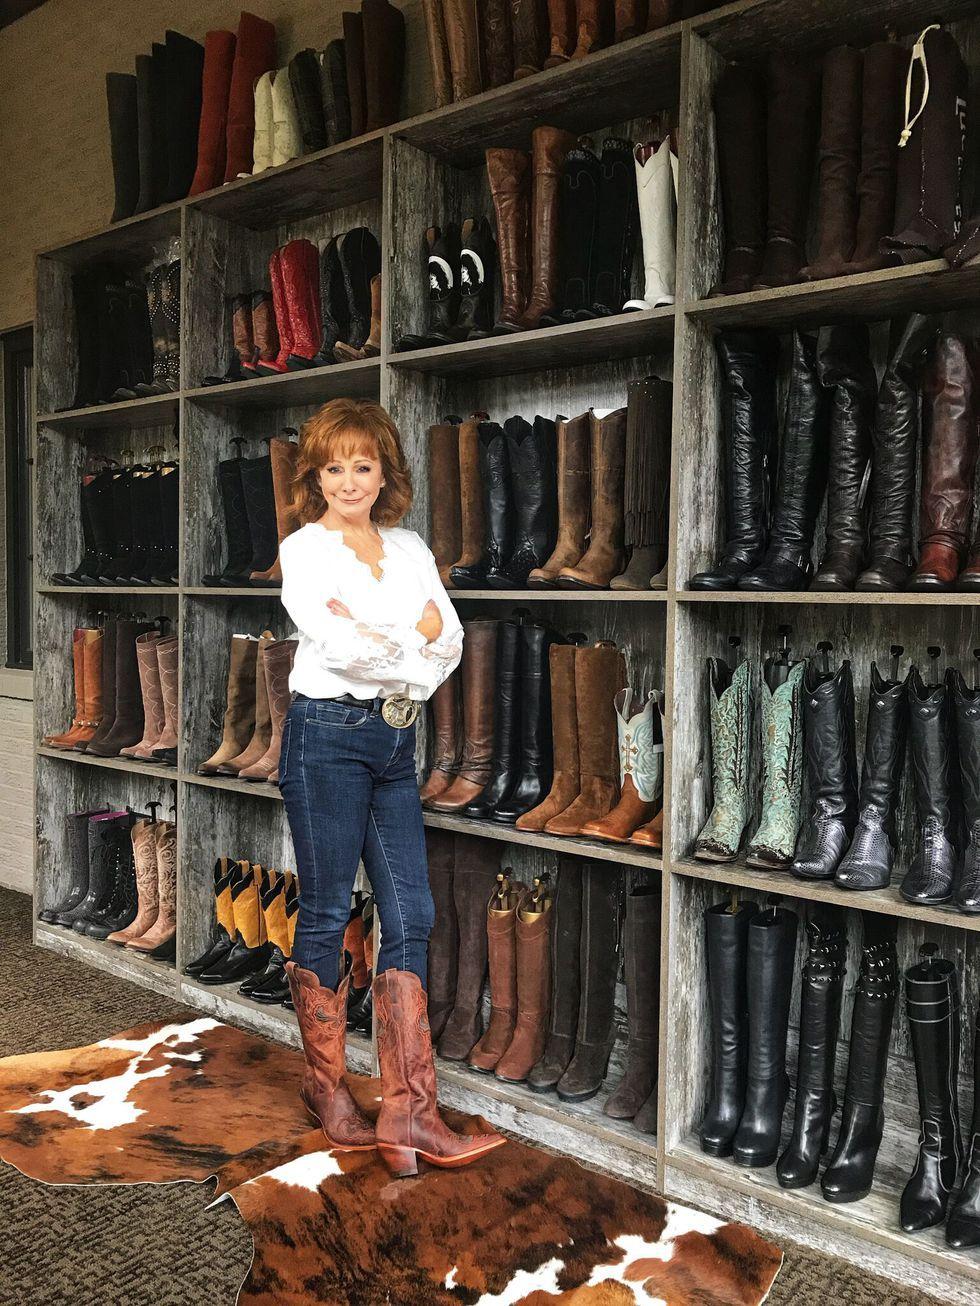 Reba McEntire's Fancy CustomBuilt Boot Closet Is Every